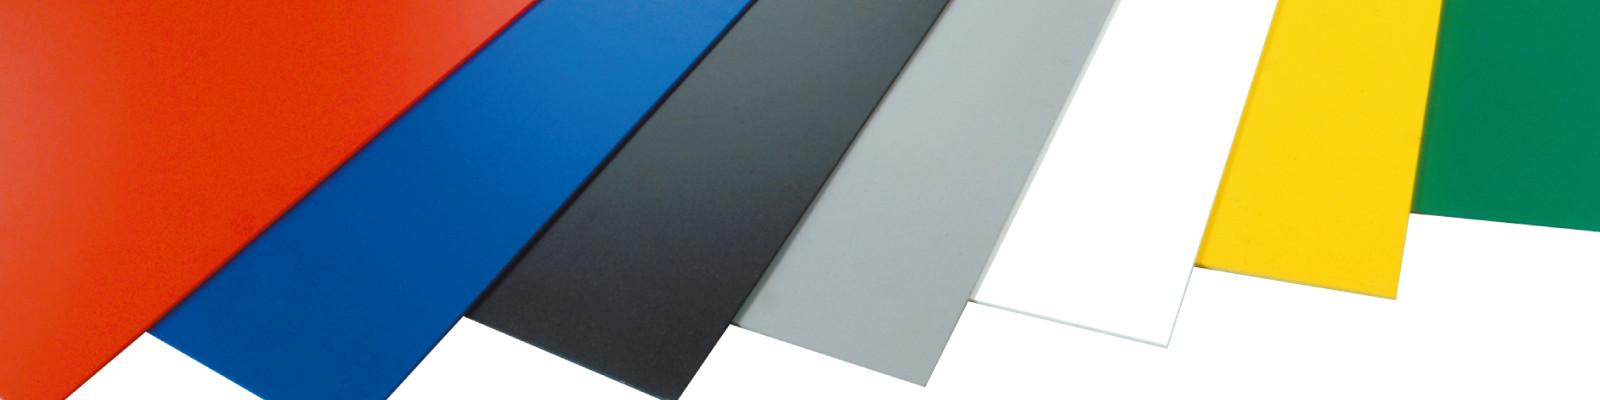 PVC Foam Sheet   Expanded PVC   Sintra   Celtec   Palight